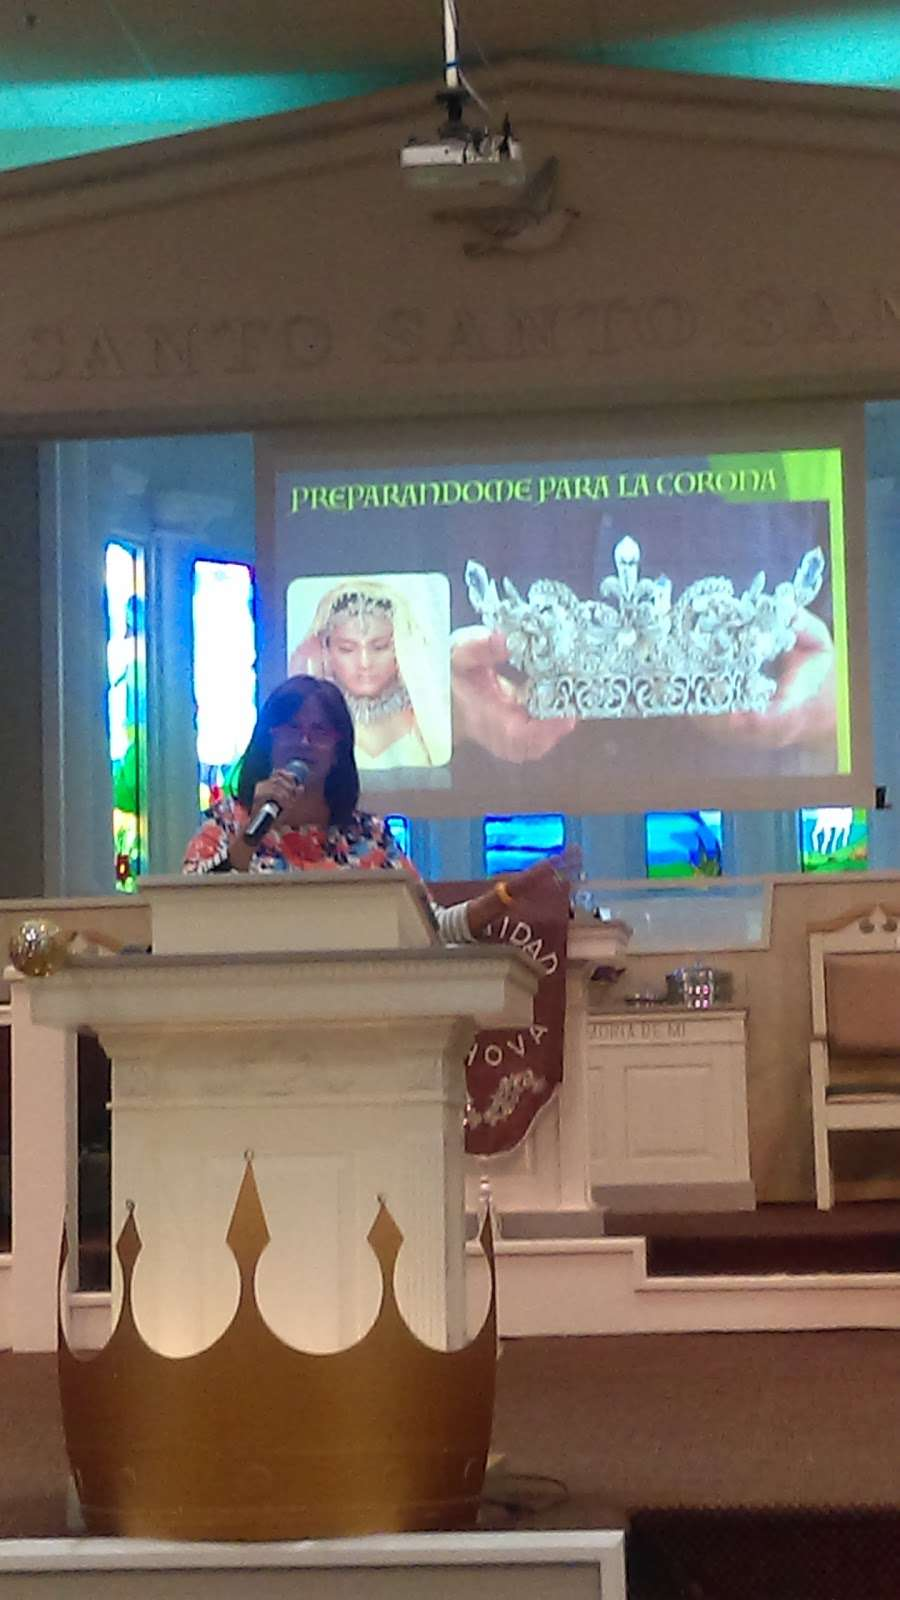 Iglesia de DIOS Pentecostal Movimiento internacional - church  | Photo 3 of 6 | Address: 3225 S Goldenrod Rd, Orlando, FL 32822, USA